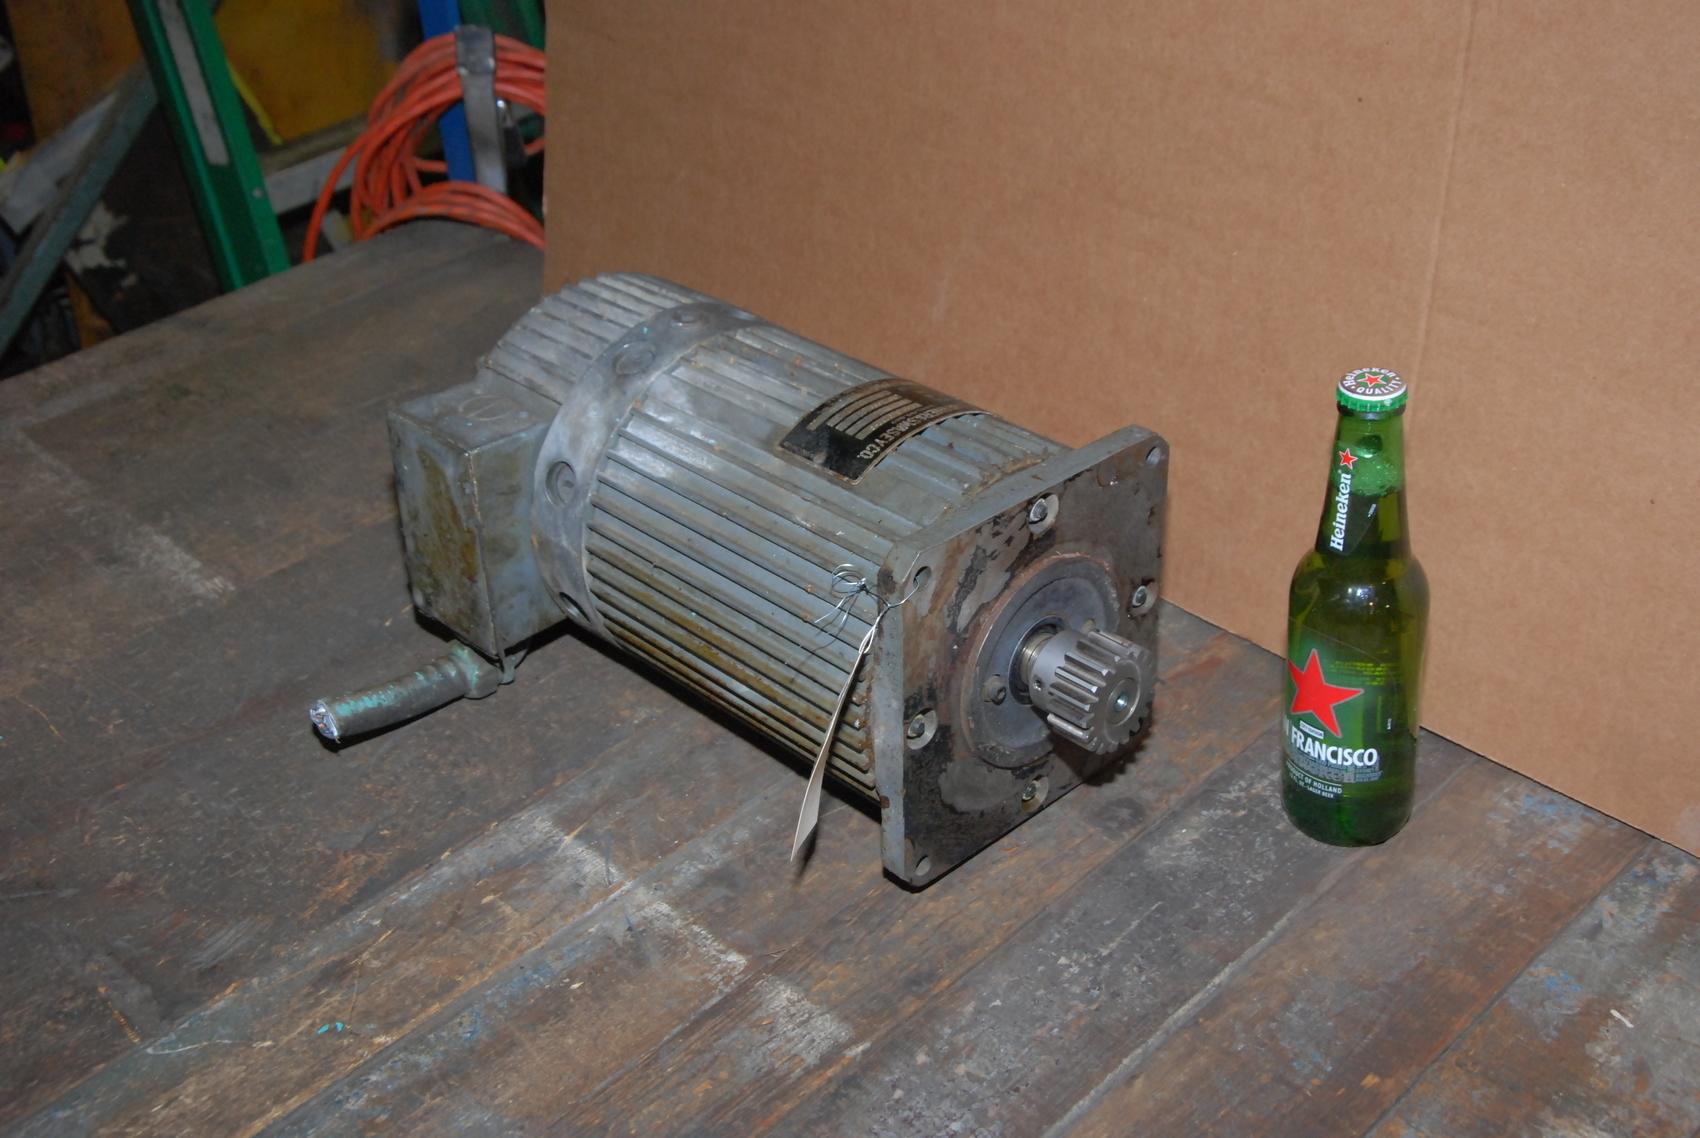 Warner and Swasey 183-18-0220-0 Servo Motor